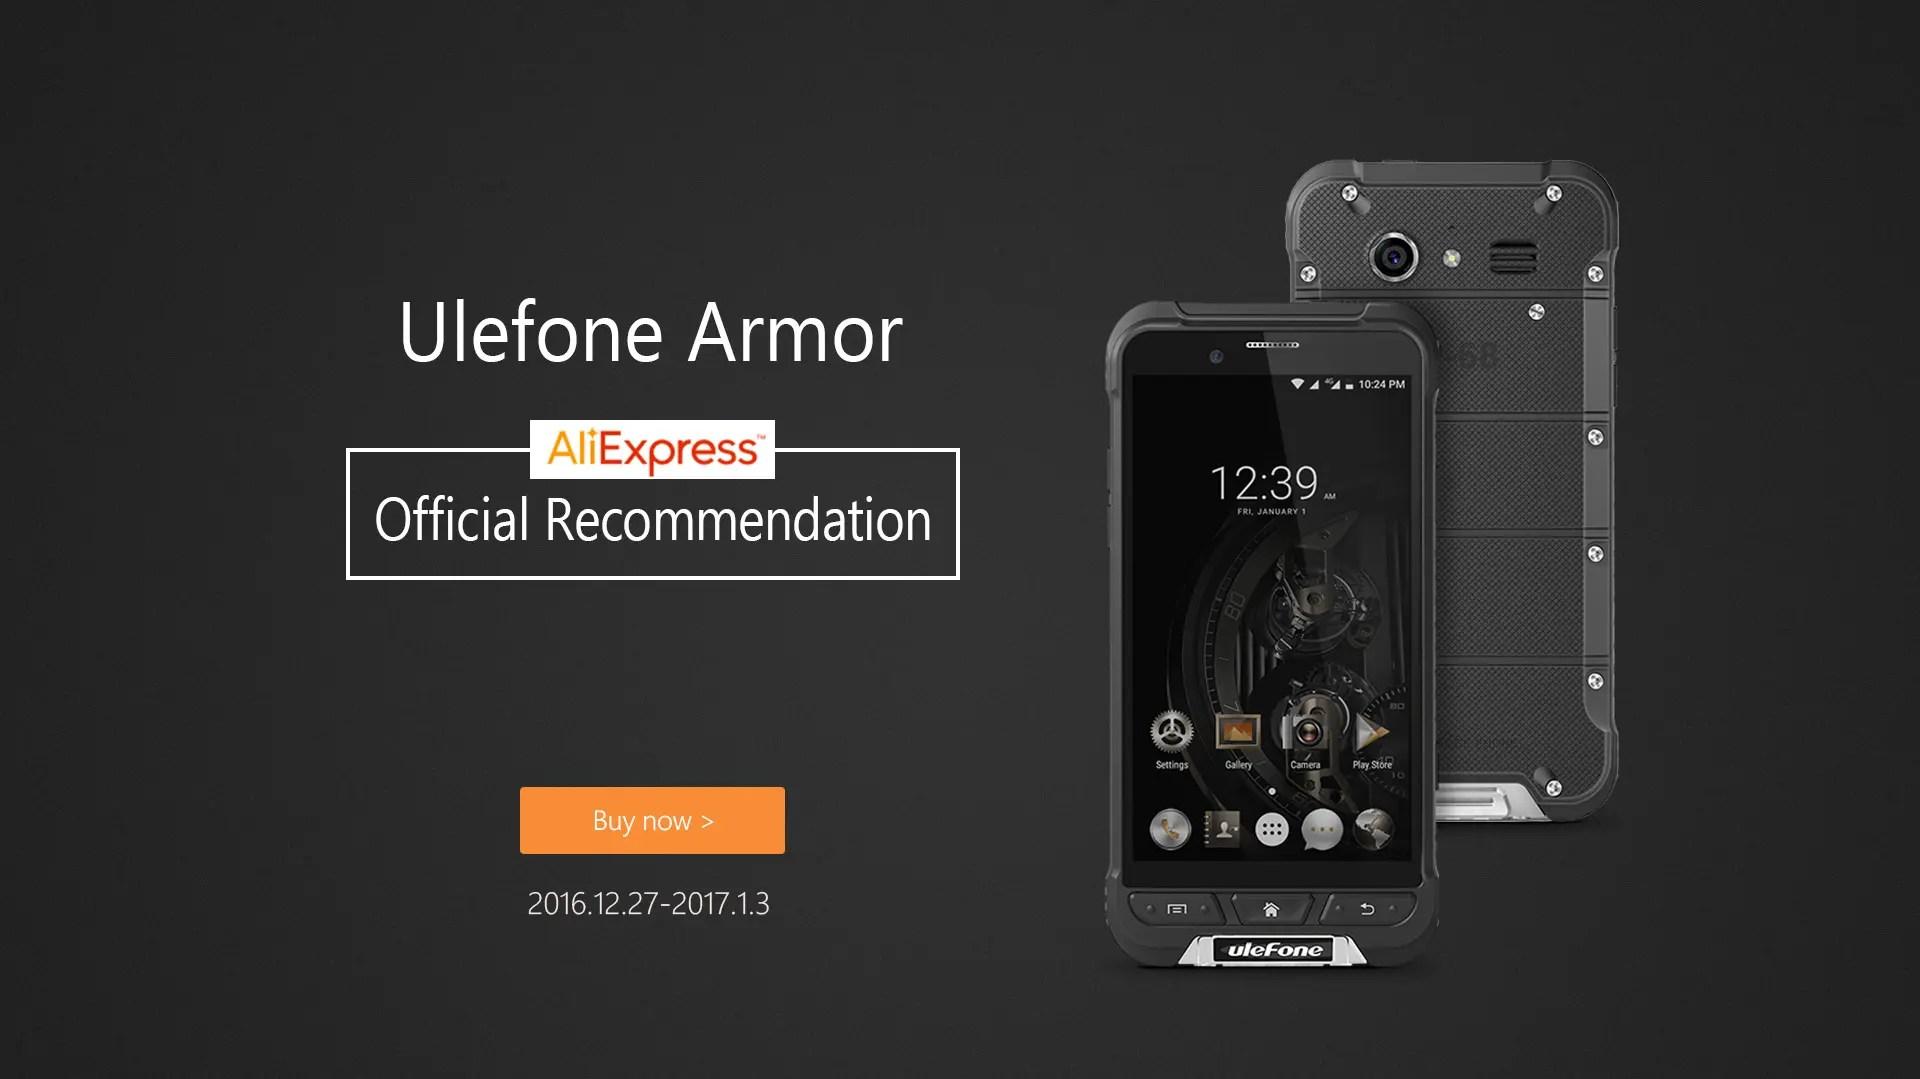 Mode emploi ulefone armor